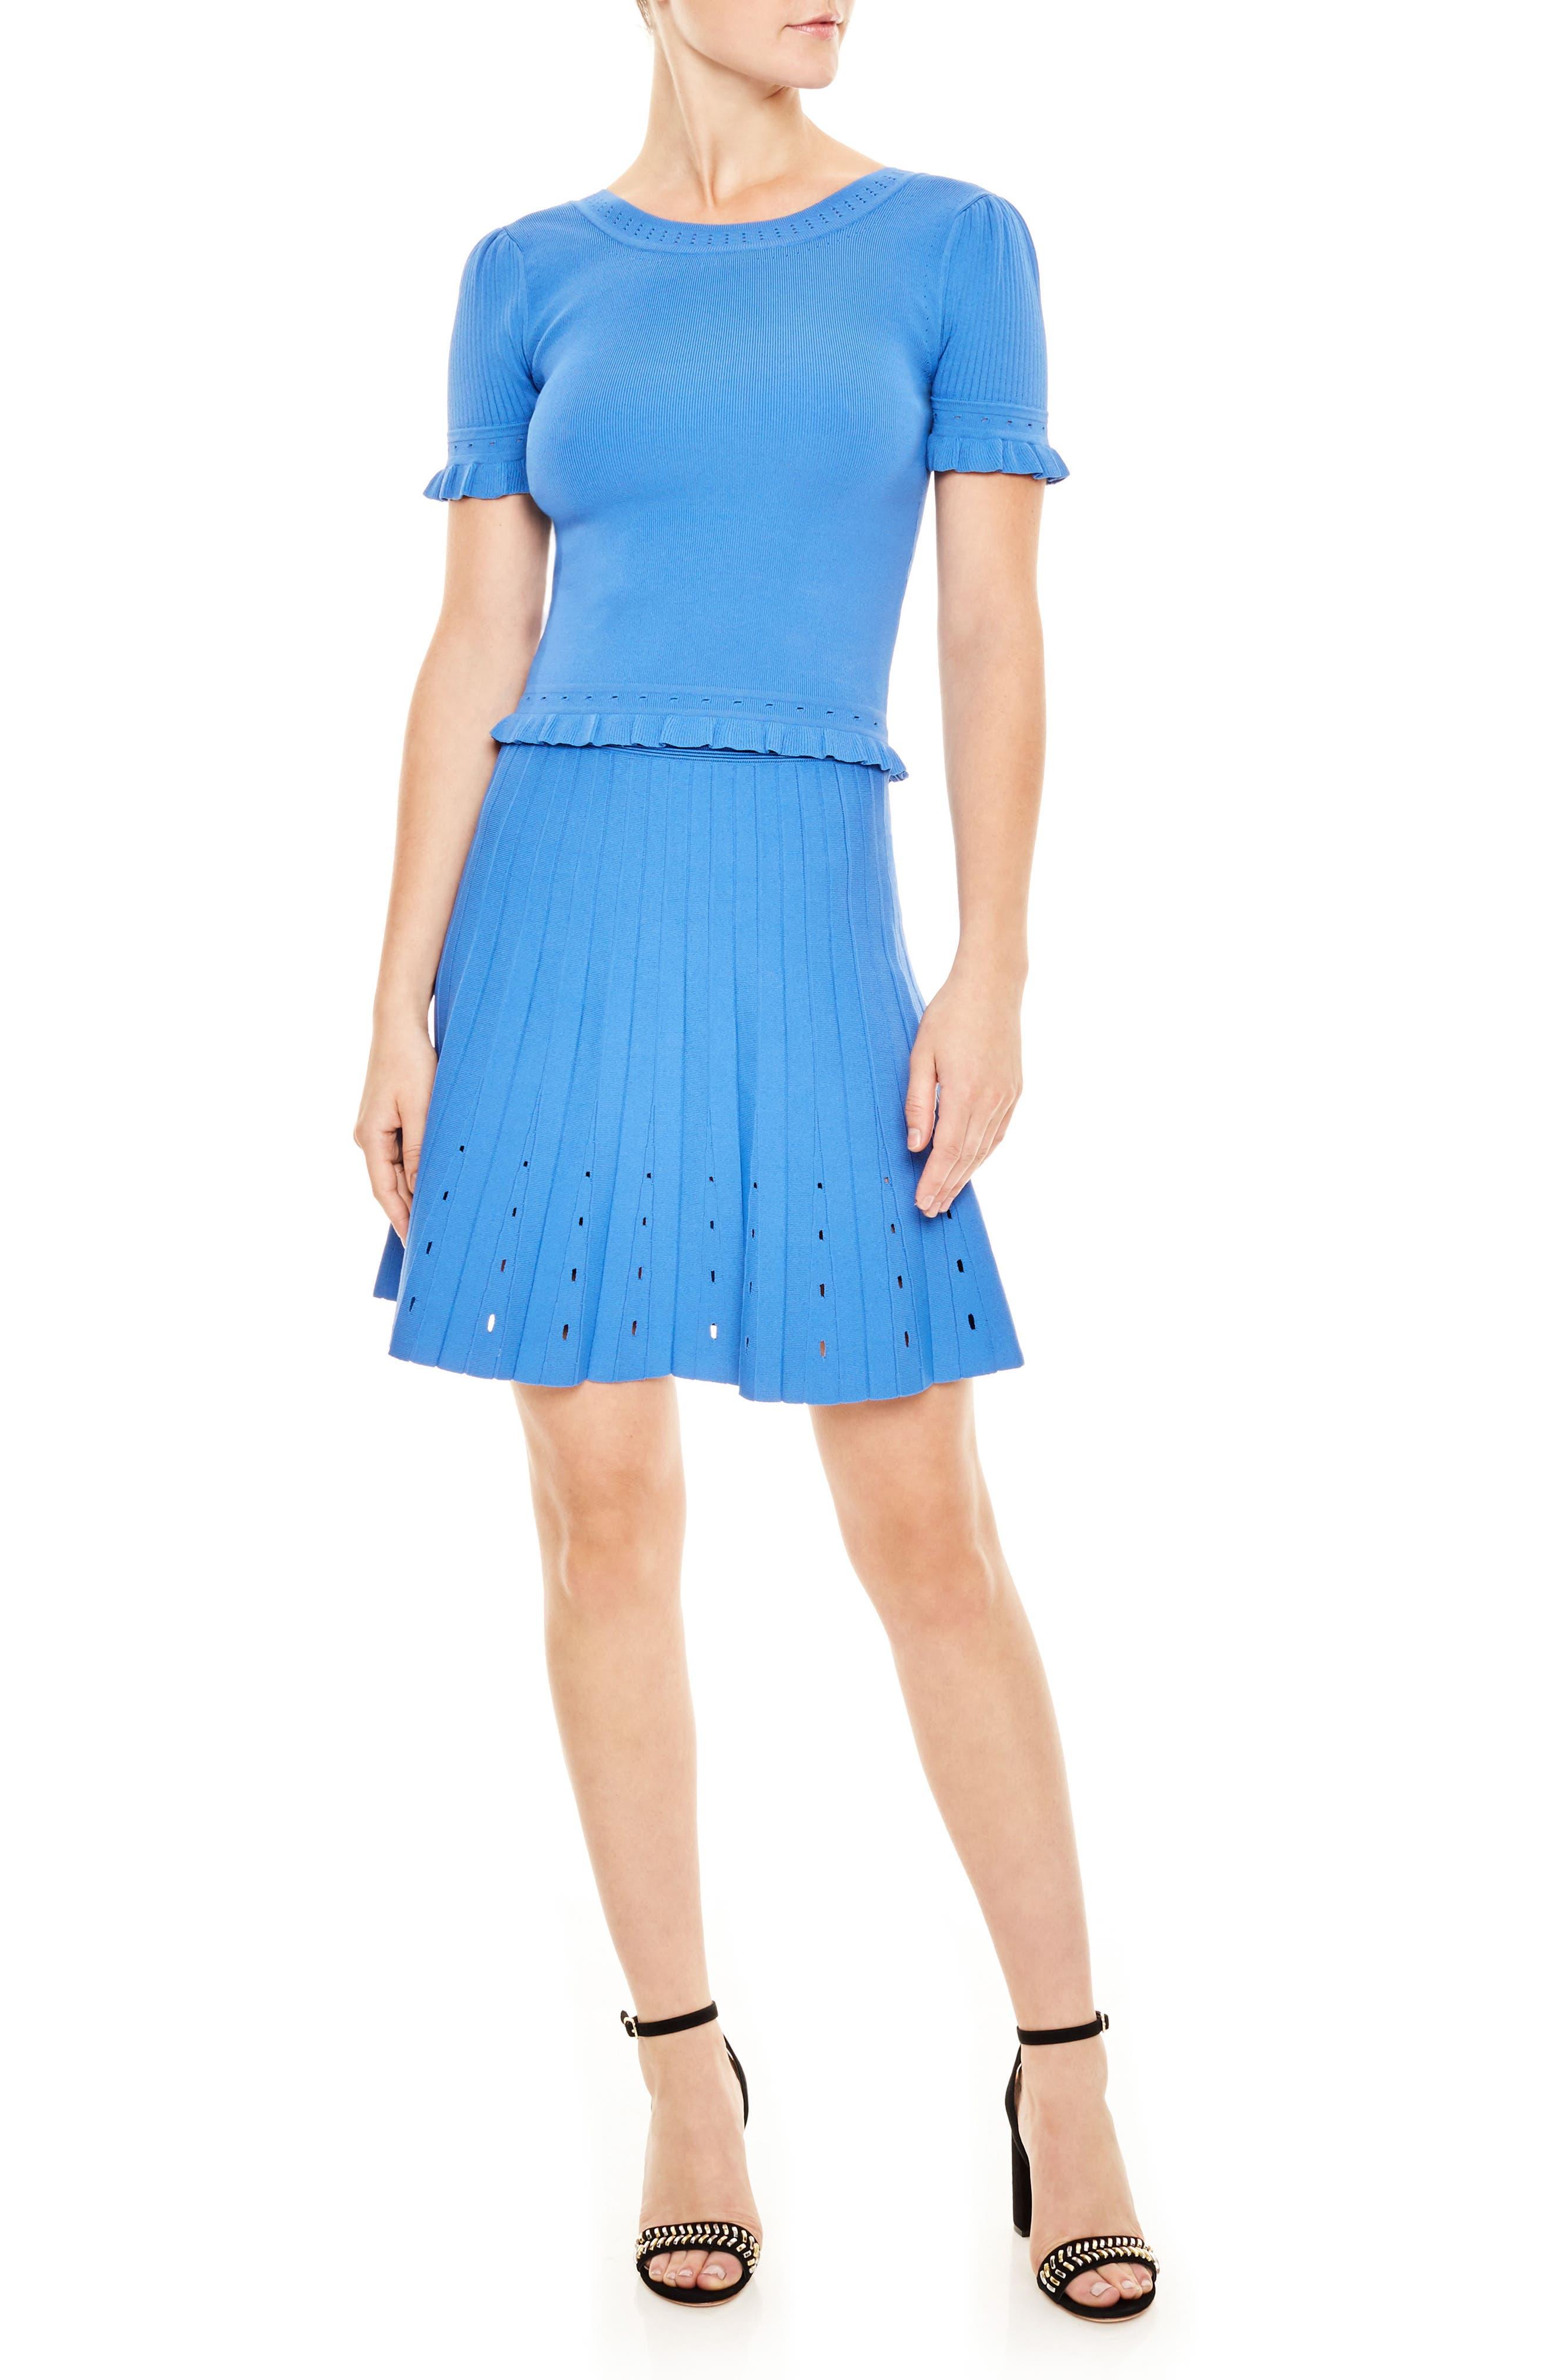 sandro Bleu Jean Knit Skirt